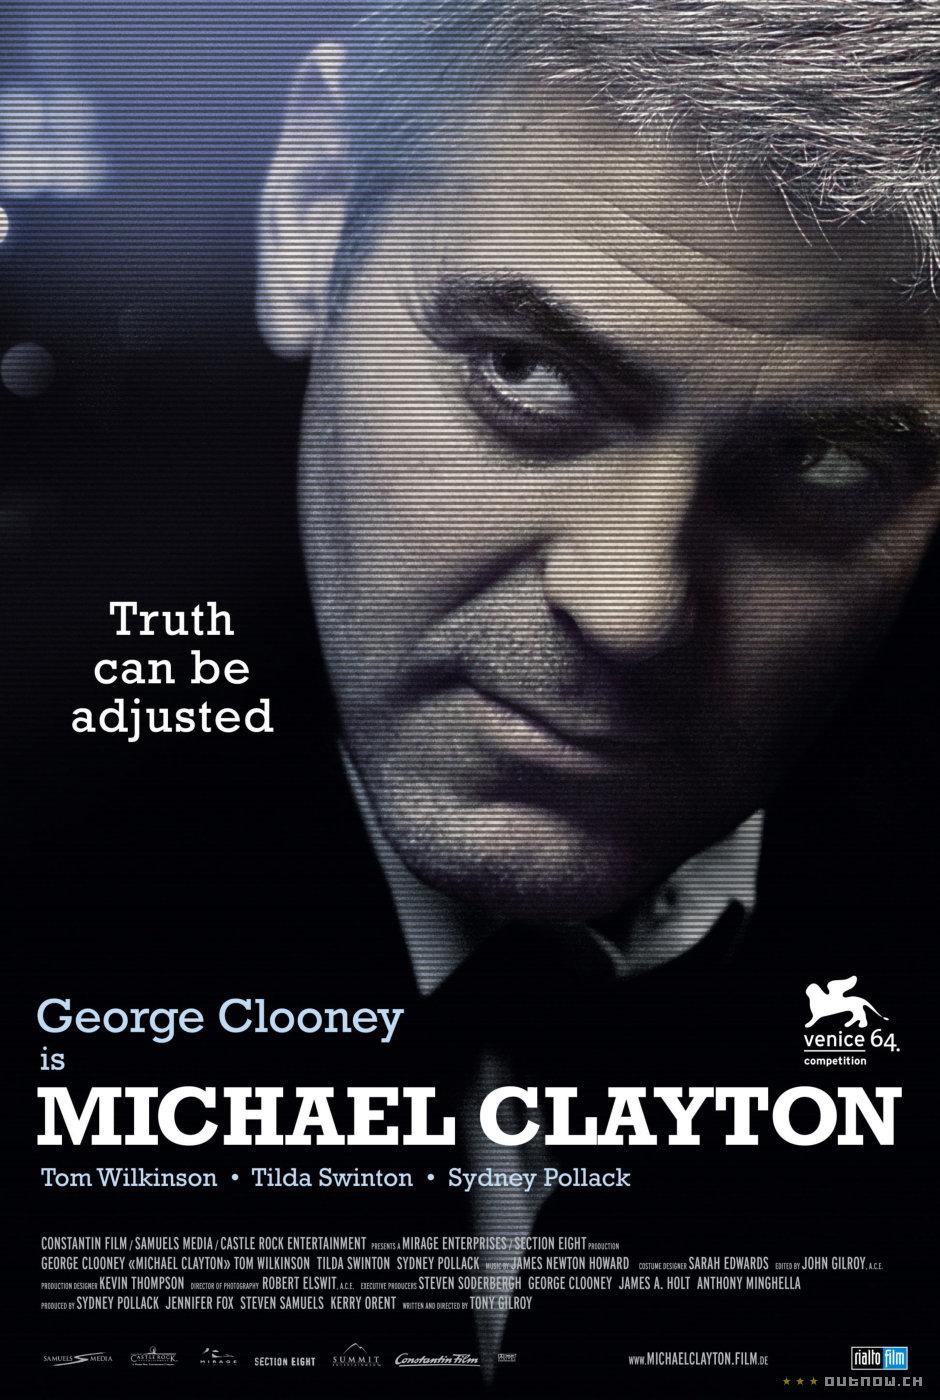 Michael Clayton de Tony Gilroy